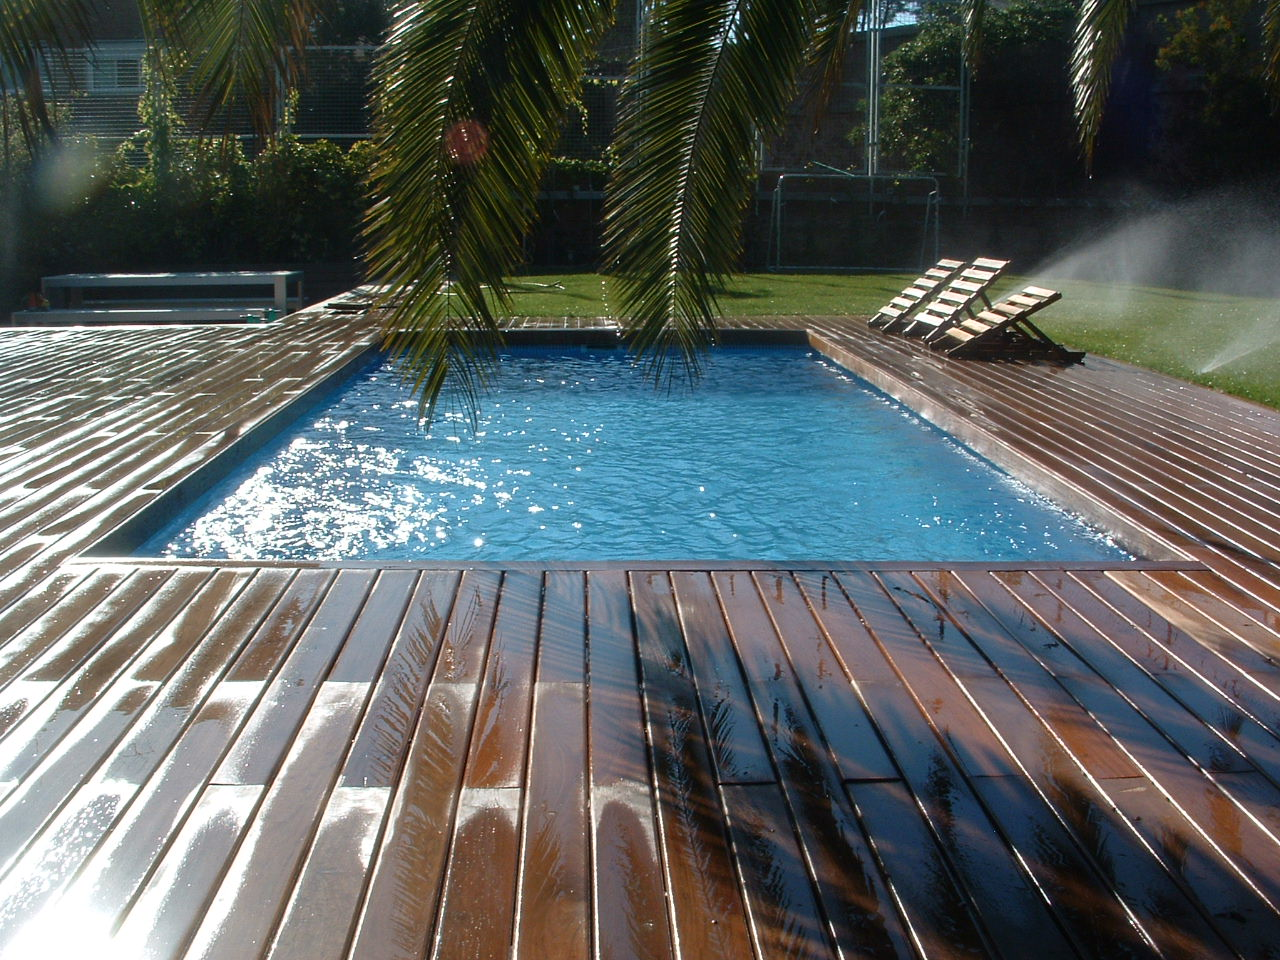 Jl padial cerrajer a de dise o estructuras exteriores y for Estructura para piscina